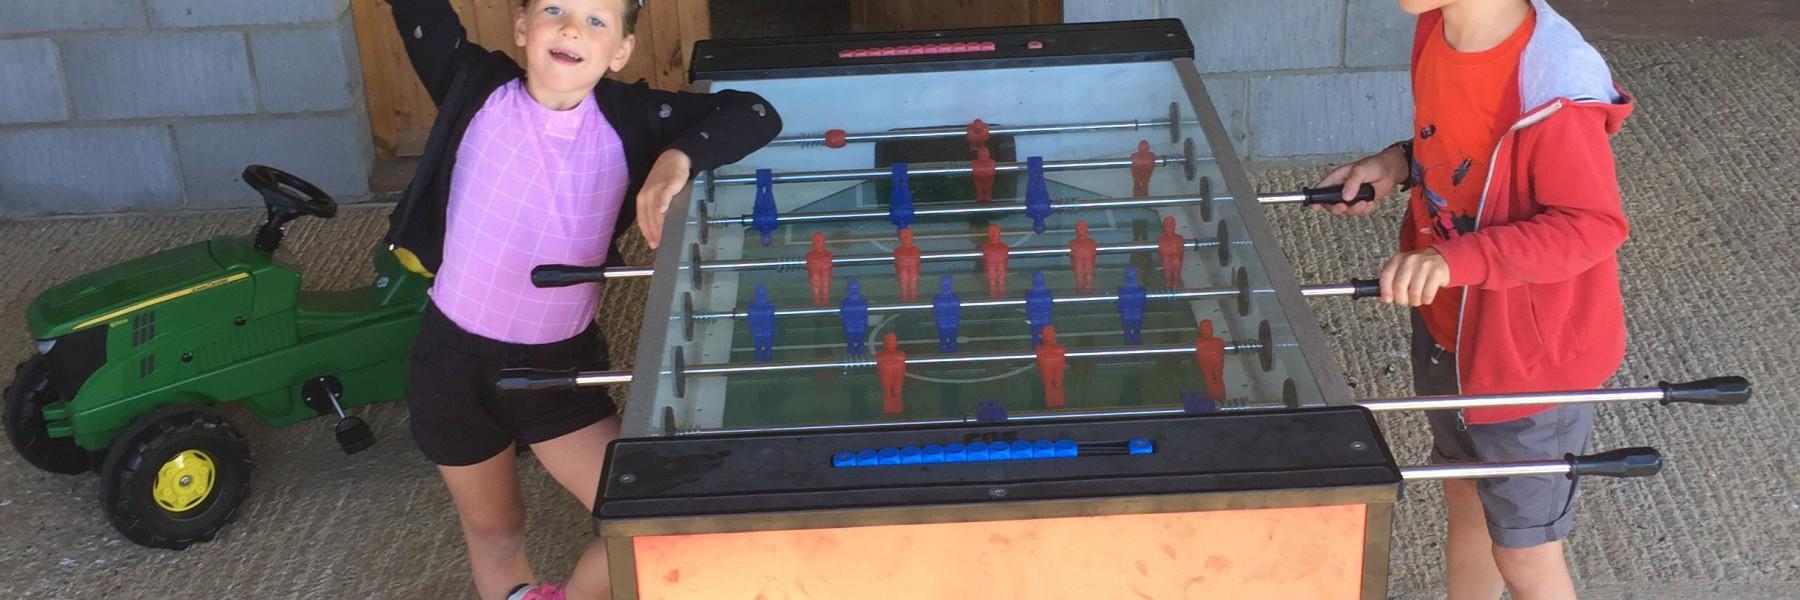 Table football for perfect family farm holidays at Wood Farm